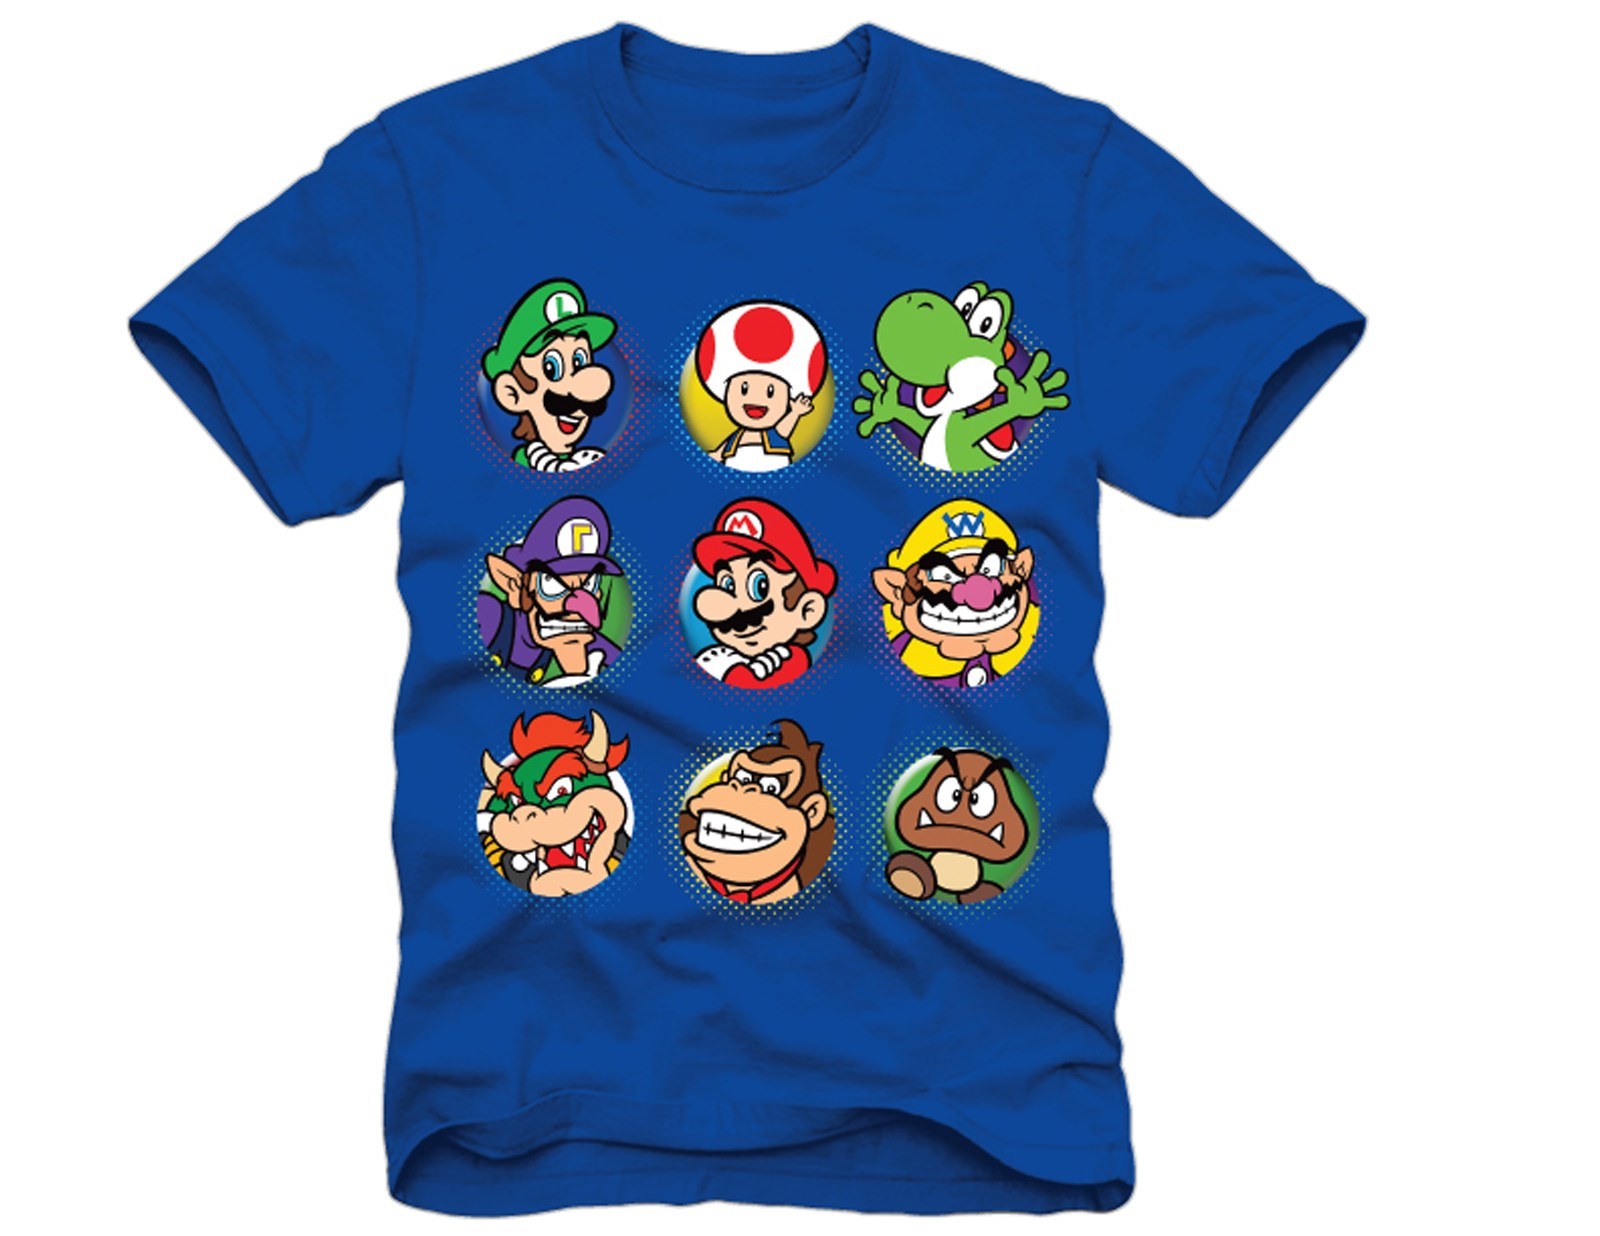 Image of Mario and Luigi T-Shirt 14